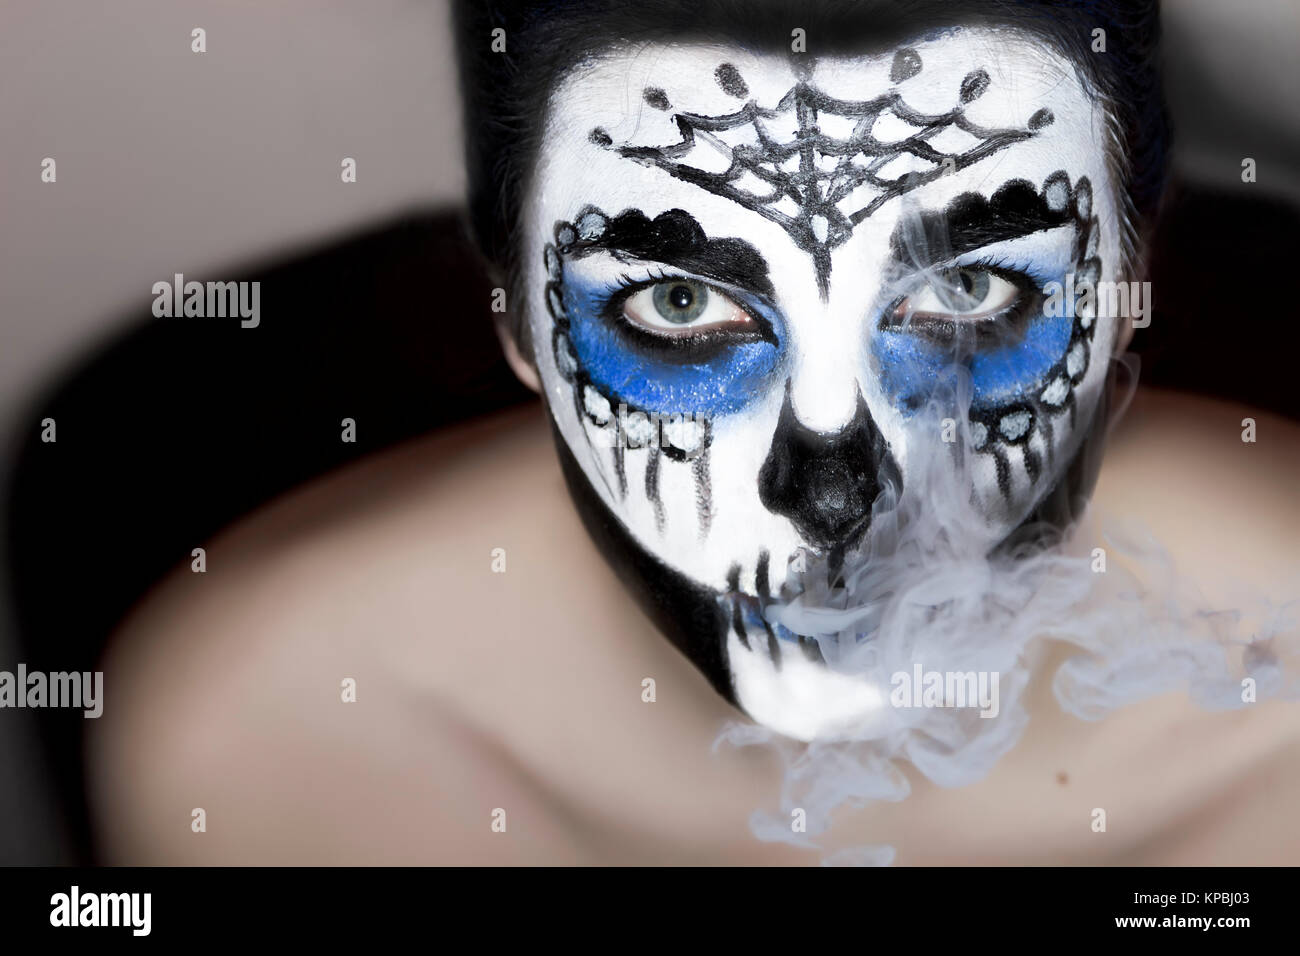 Halloween make up sugar skull Santa Muerte concept. - Stock Image